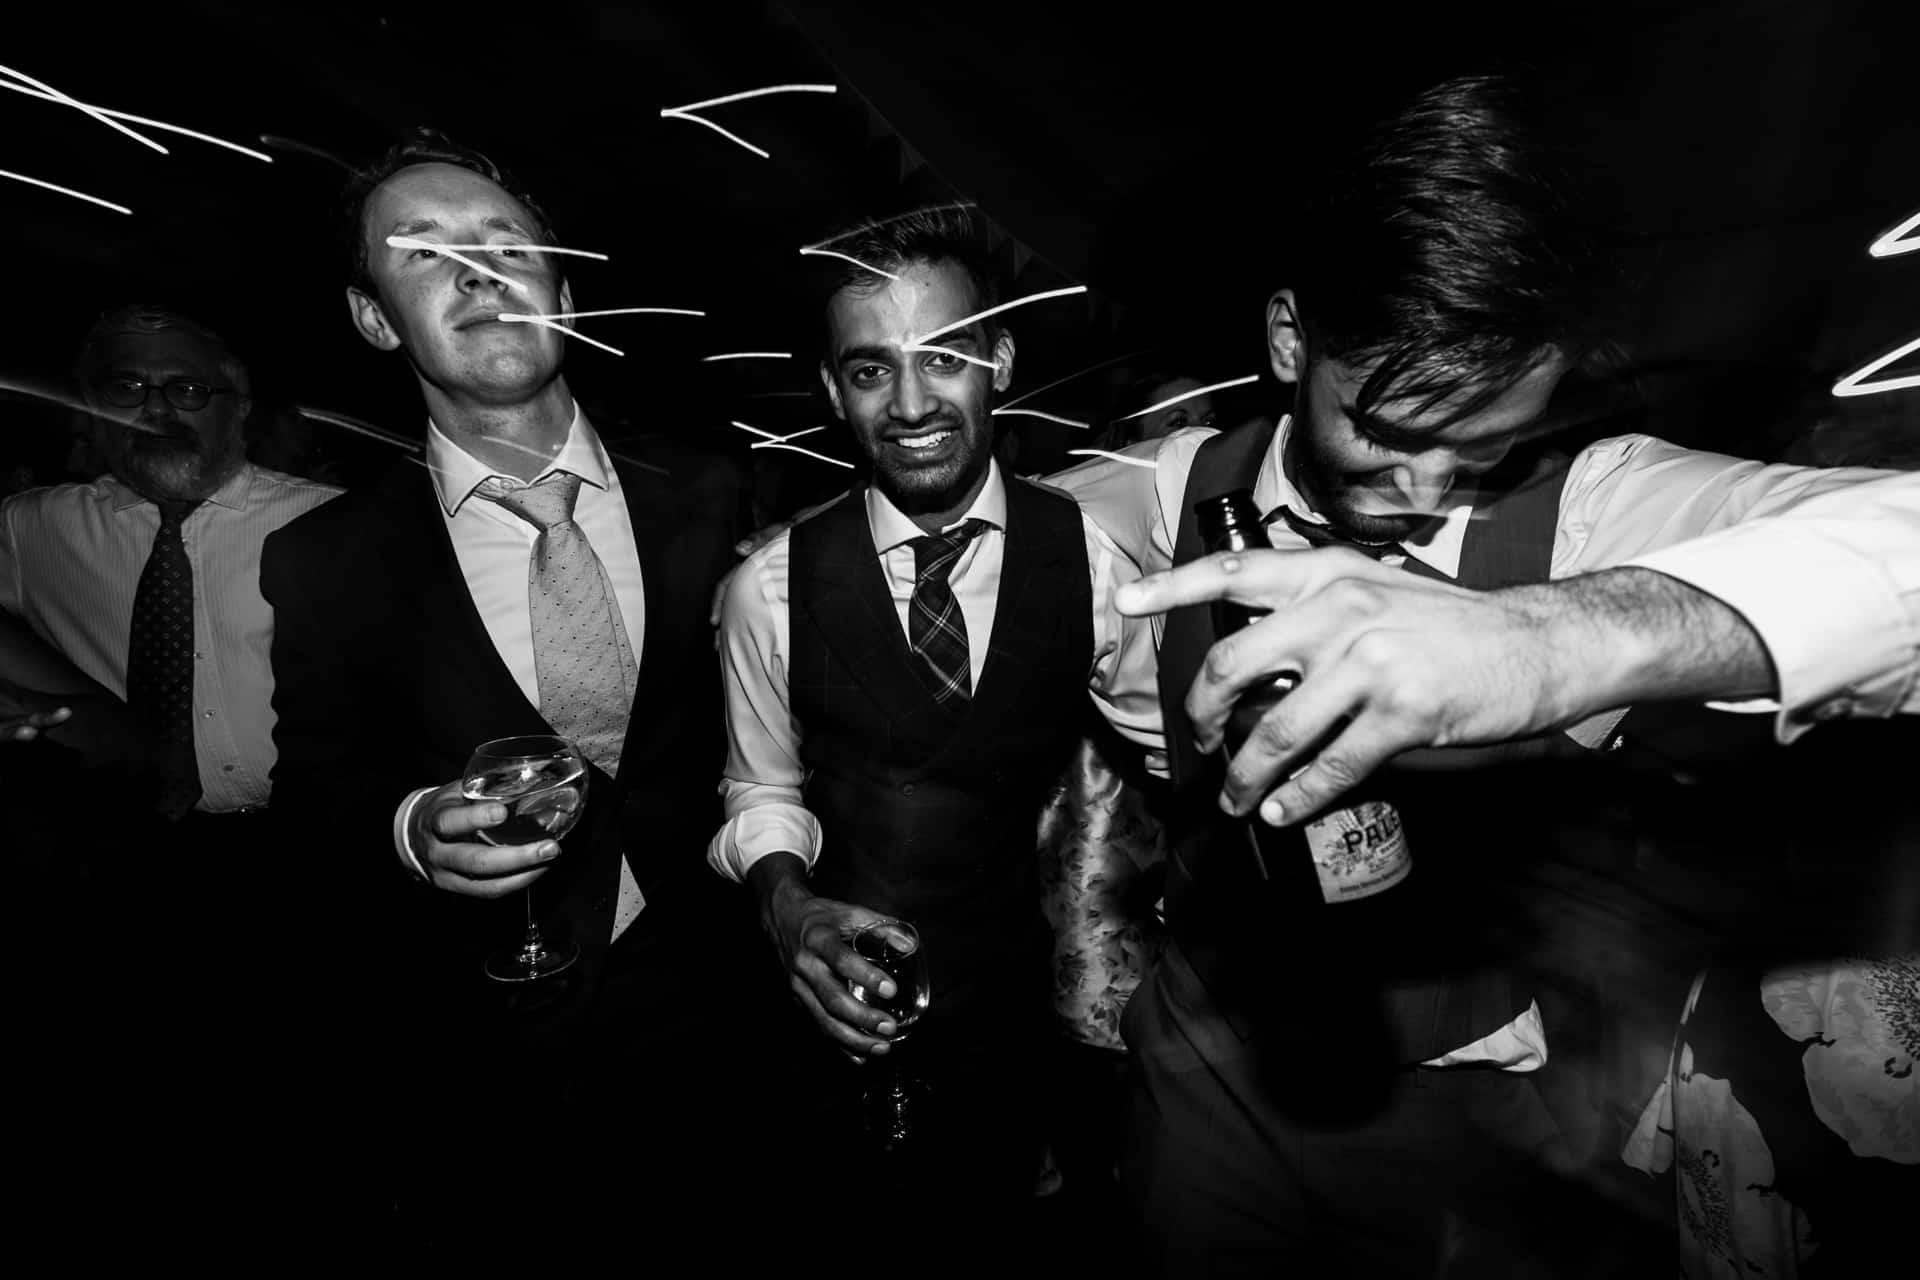 dancefloor drunks at Owen House barn wedding